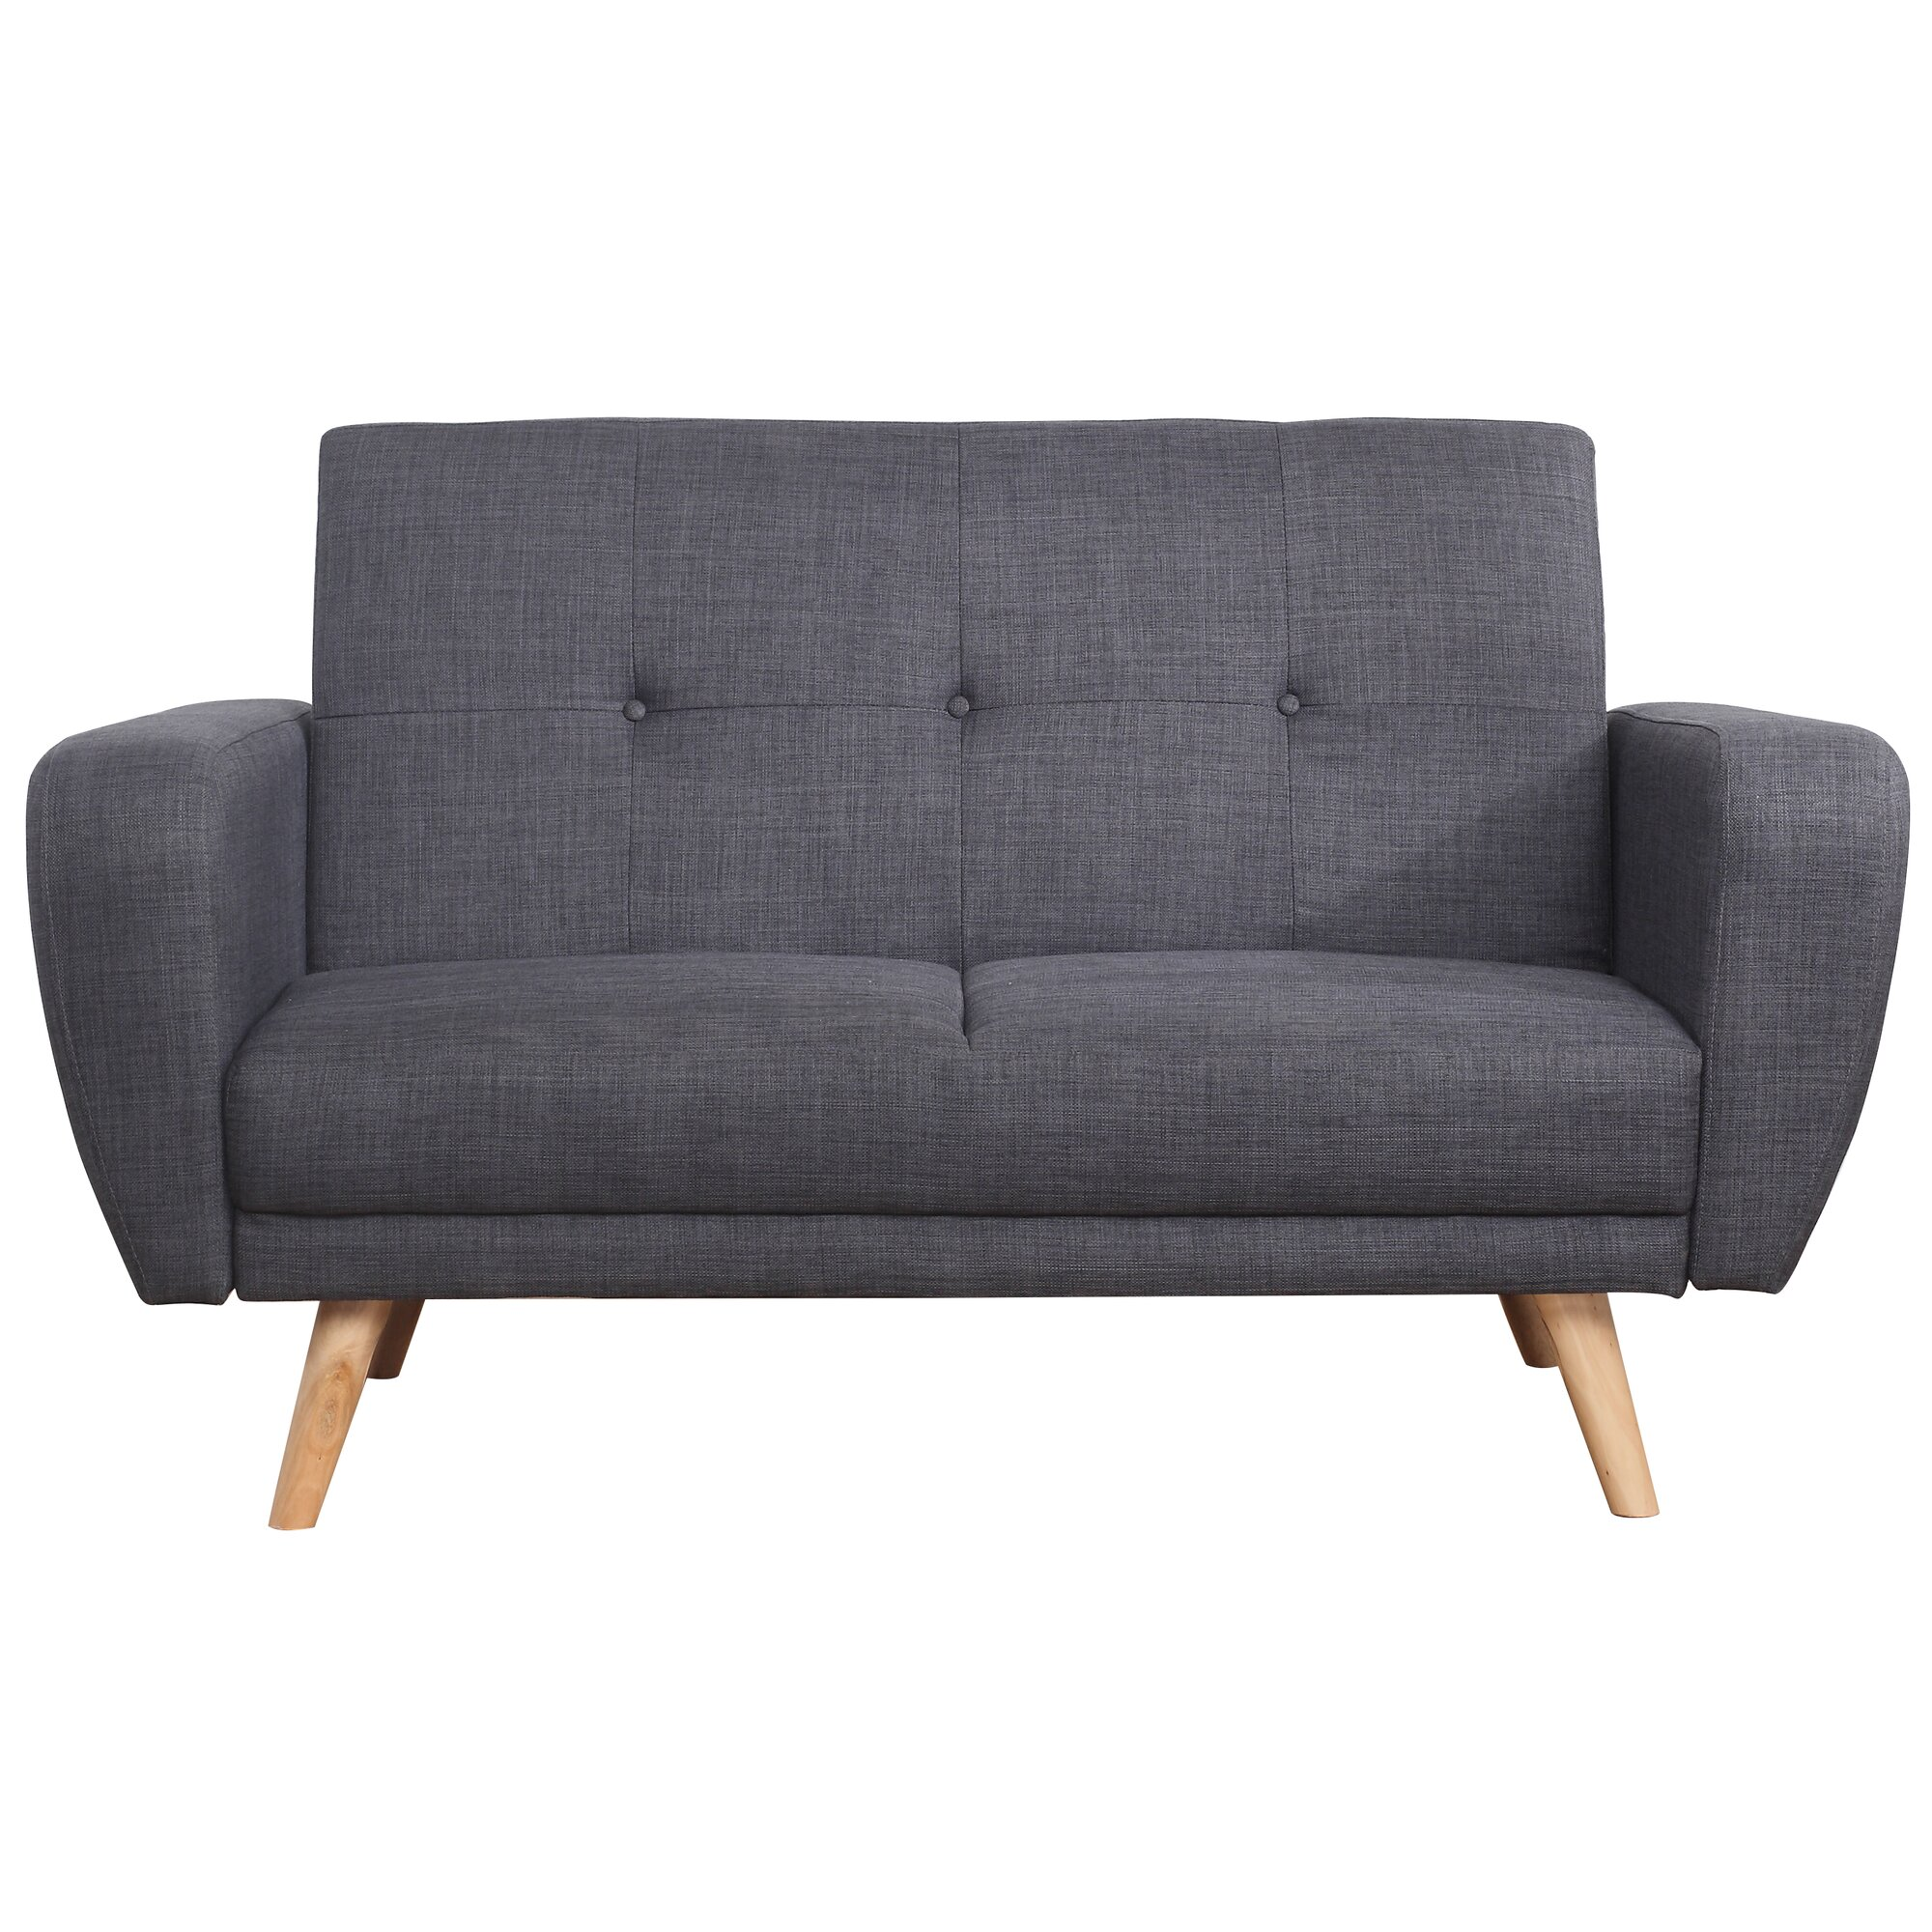 Fj Rde Co Kari 2 Seater Clic Clac Sofa Bed Reviews